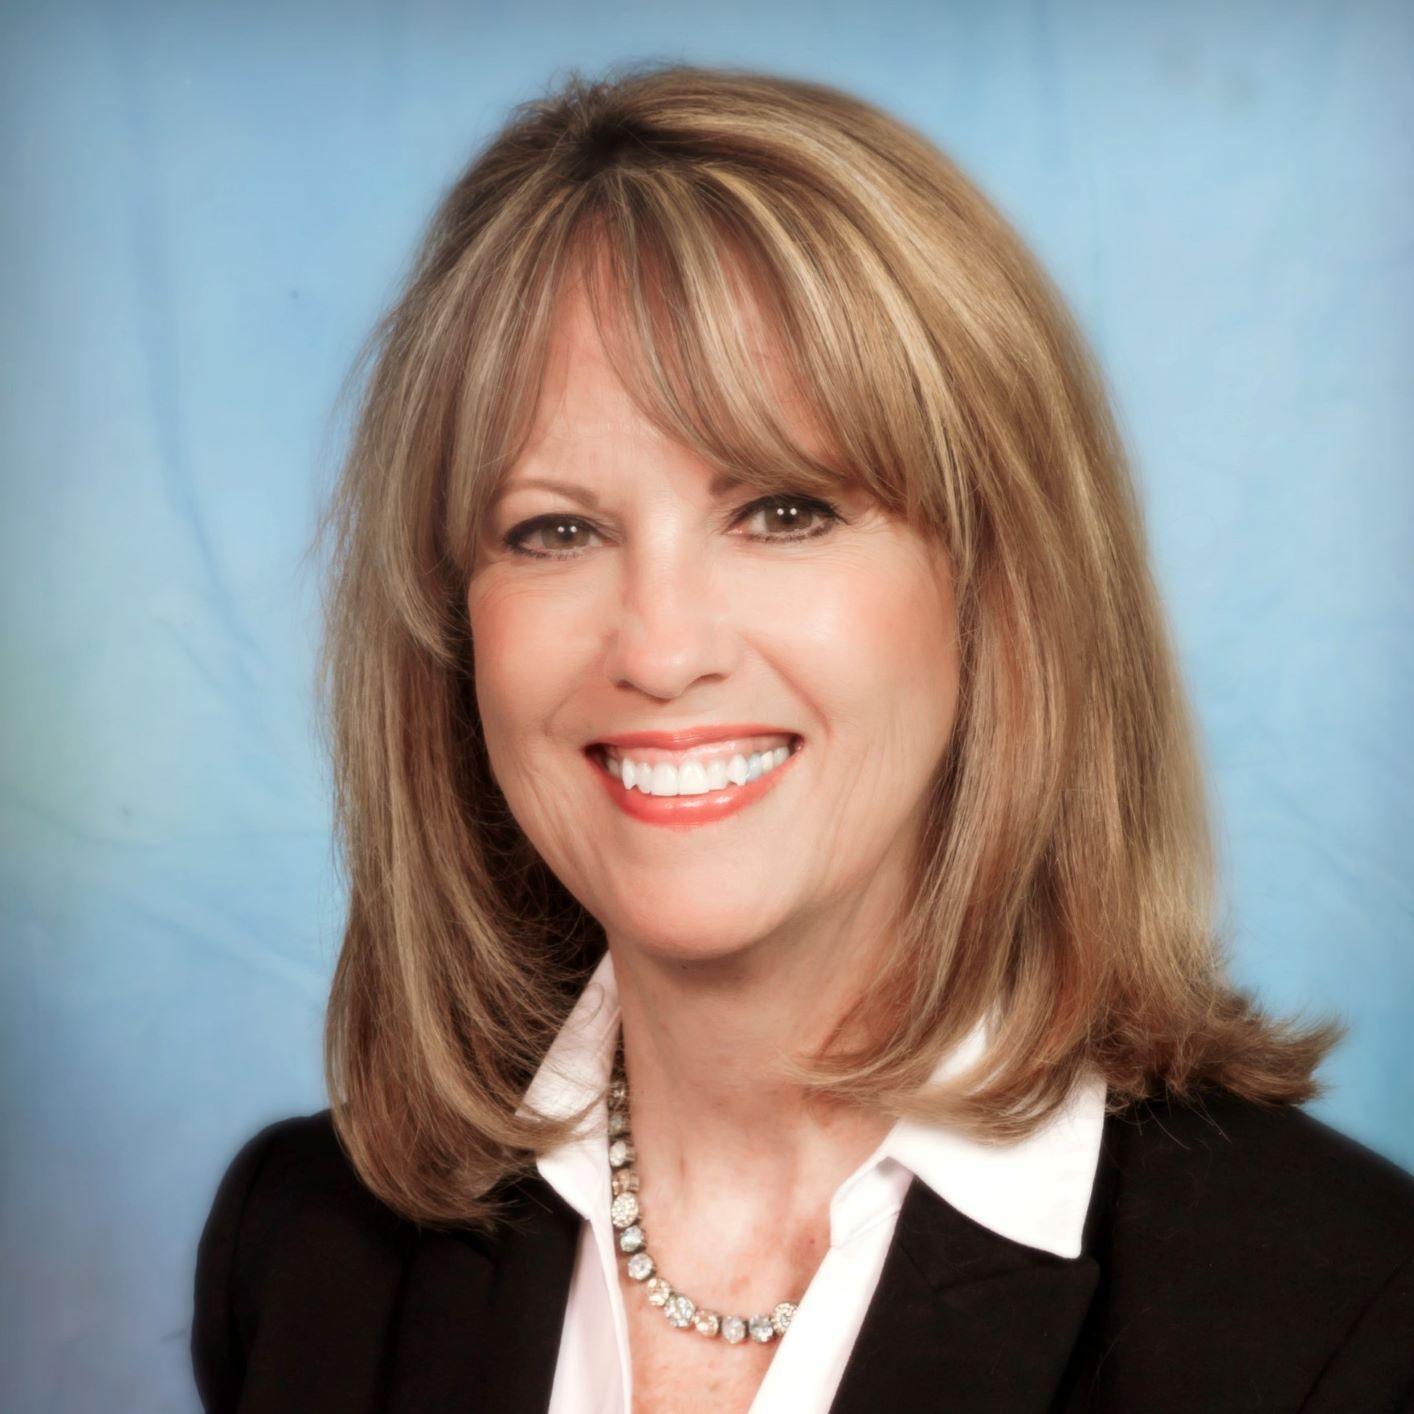 JOANNE REINHART  Your Registered Representative & Insurance Agent